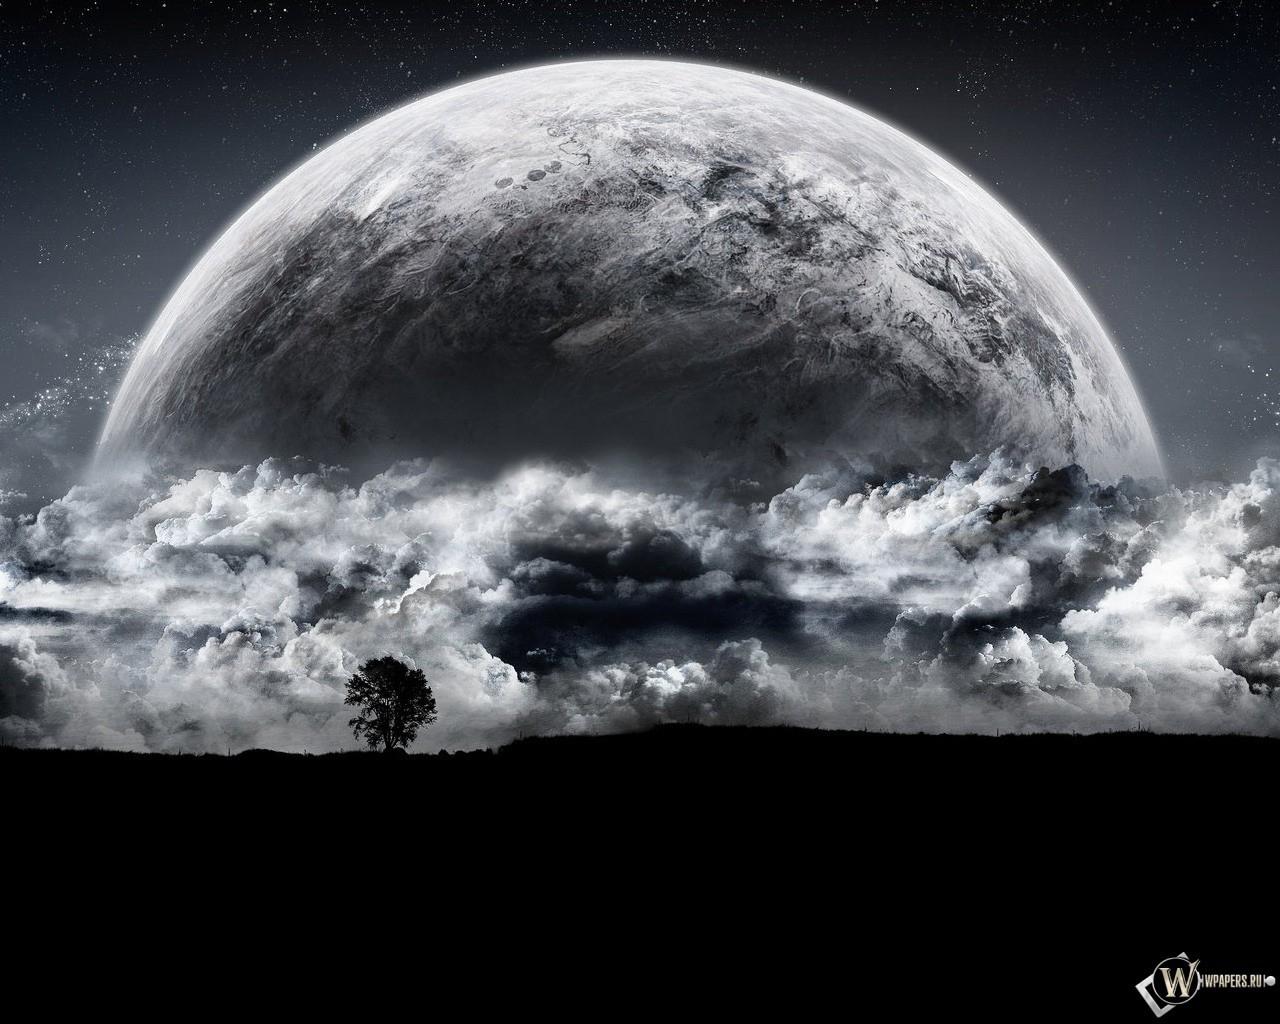 Луна фантастика 1280x1024 картинки